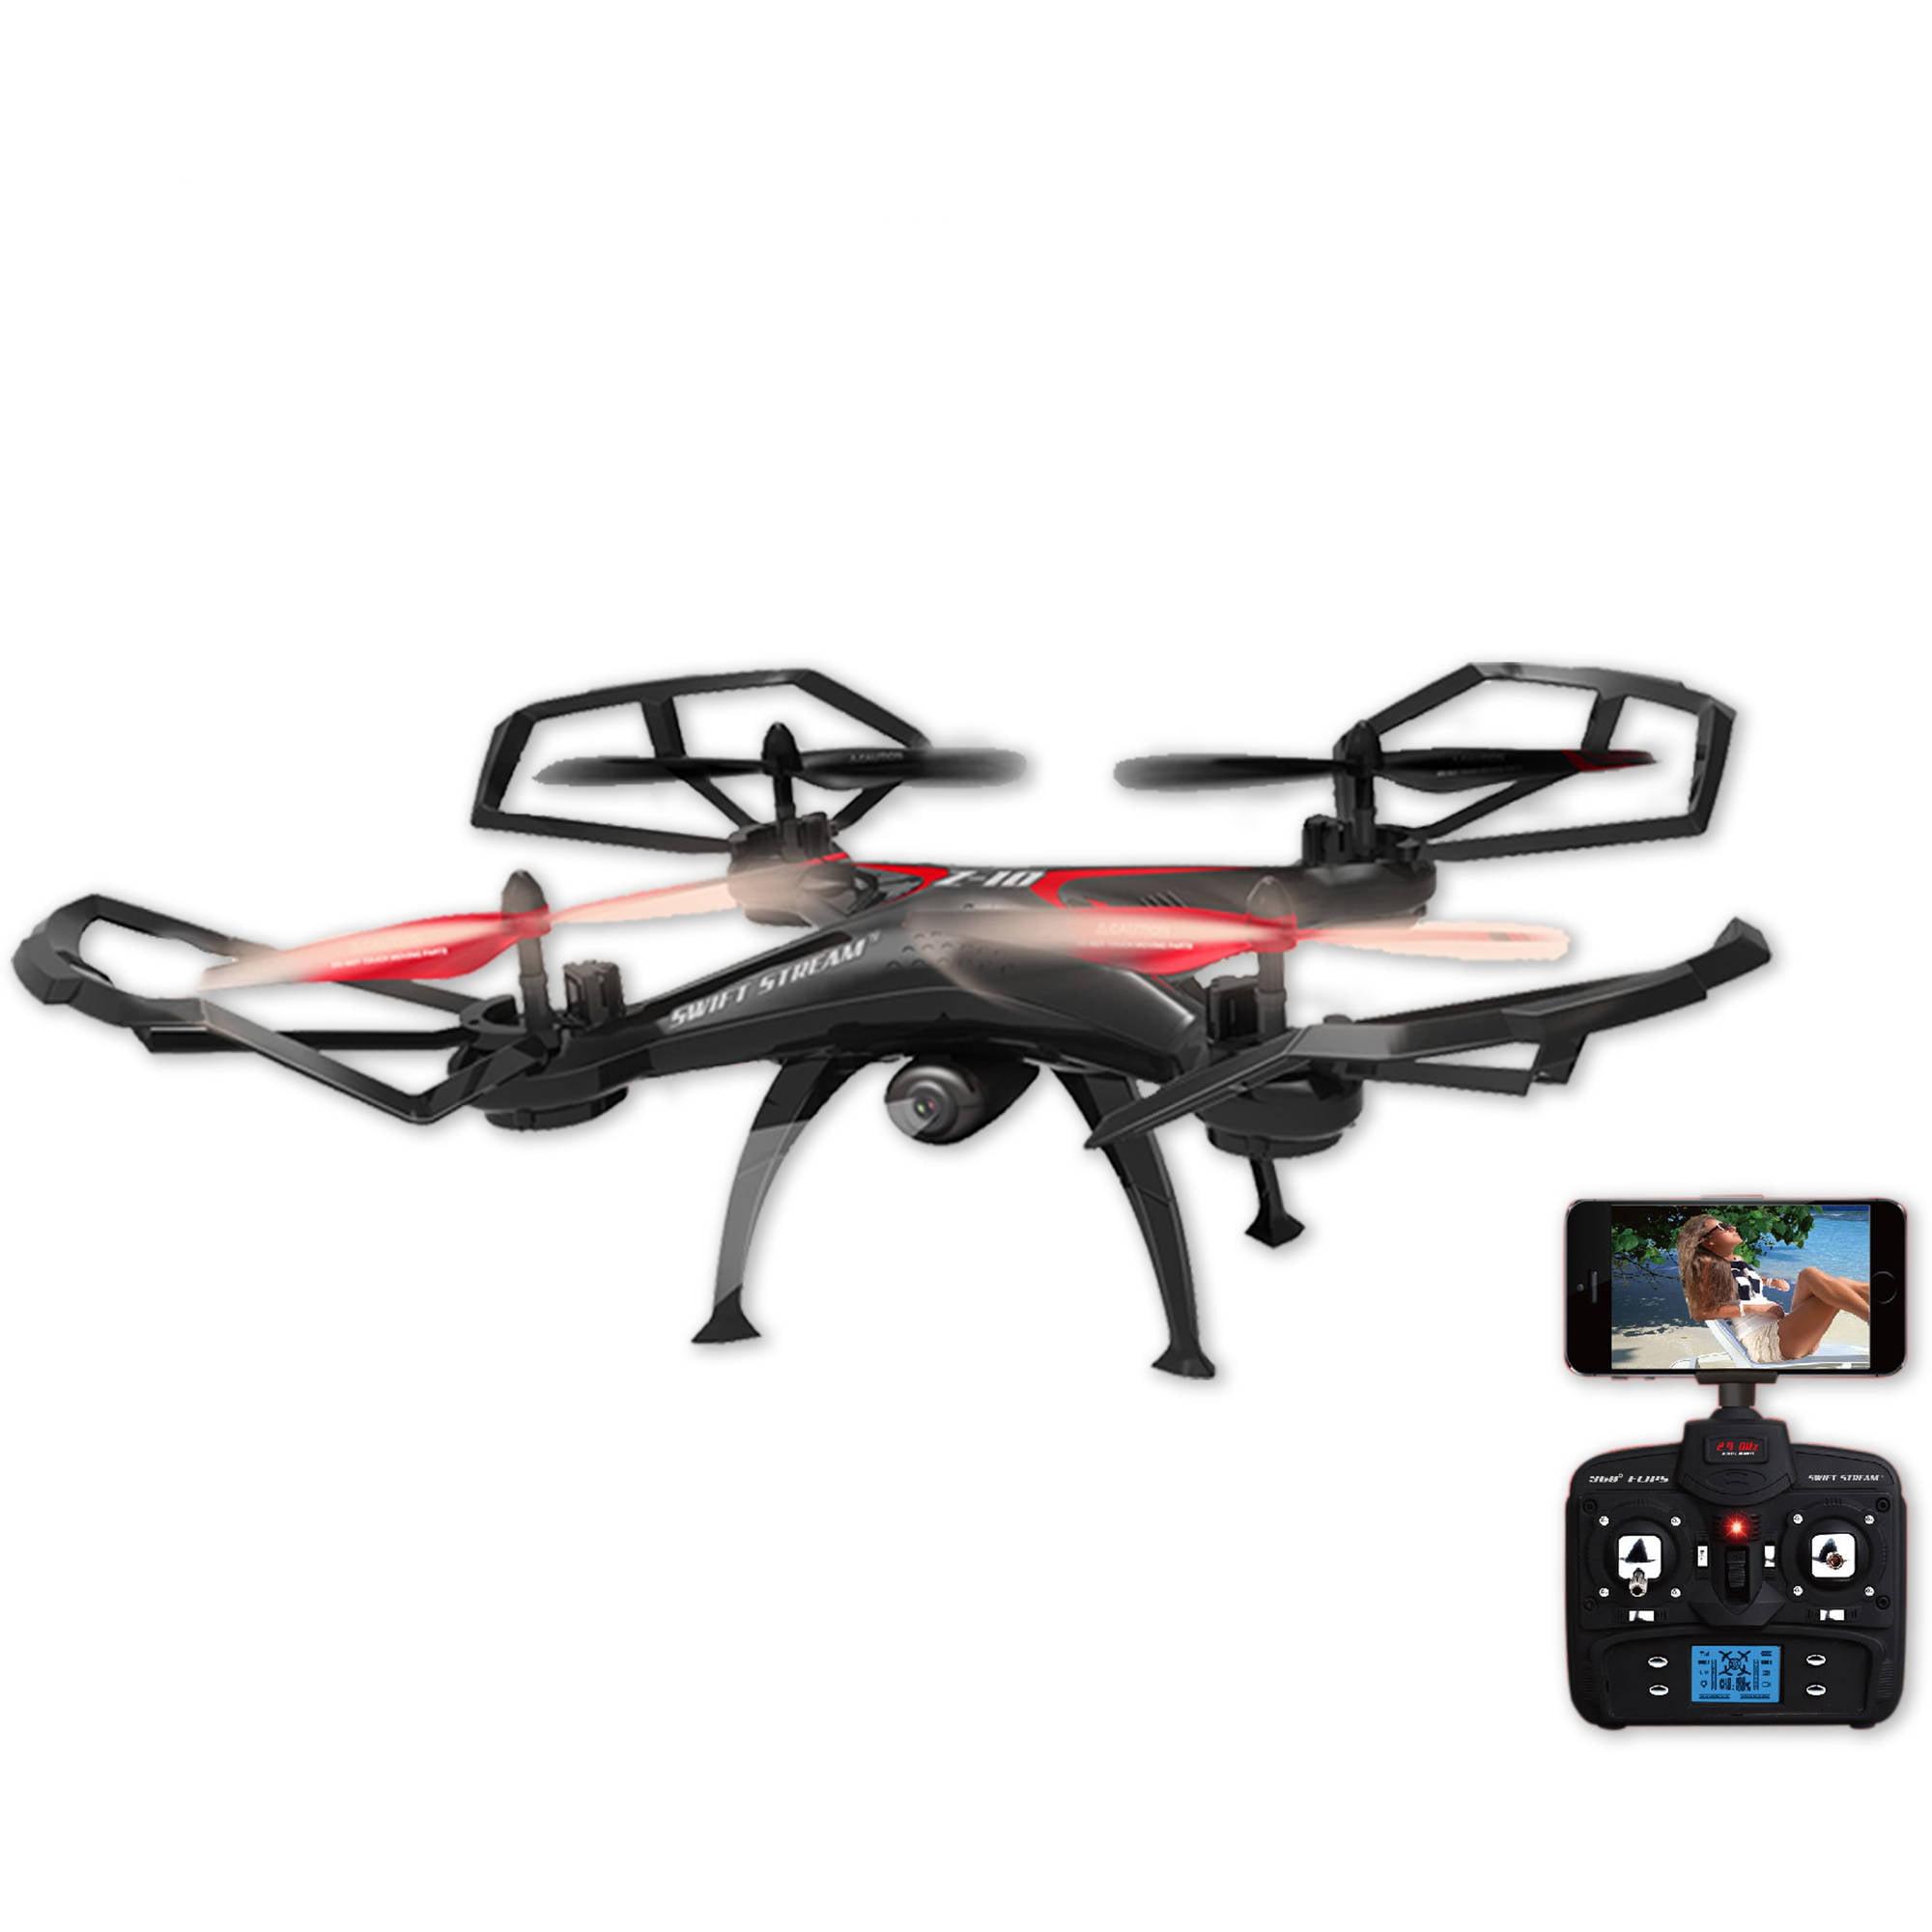 Abrim Enterprises, Inc. Swift Stream Z - 10 Large 19in Hobby Grade Remote Control Quadcopter Drone with Wifi Camera, Black